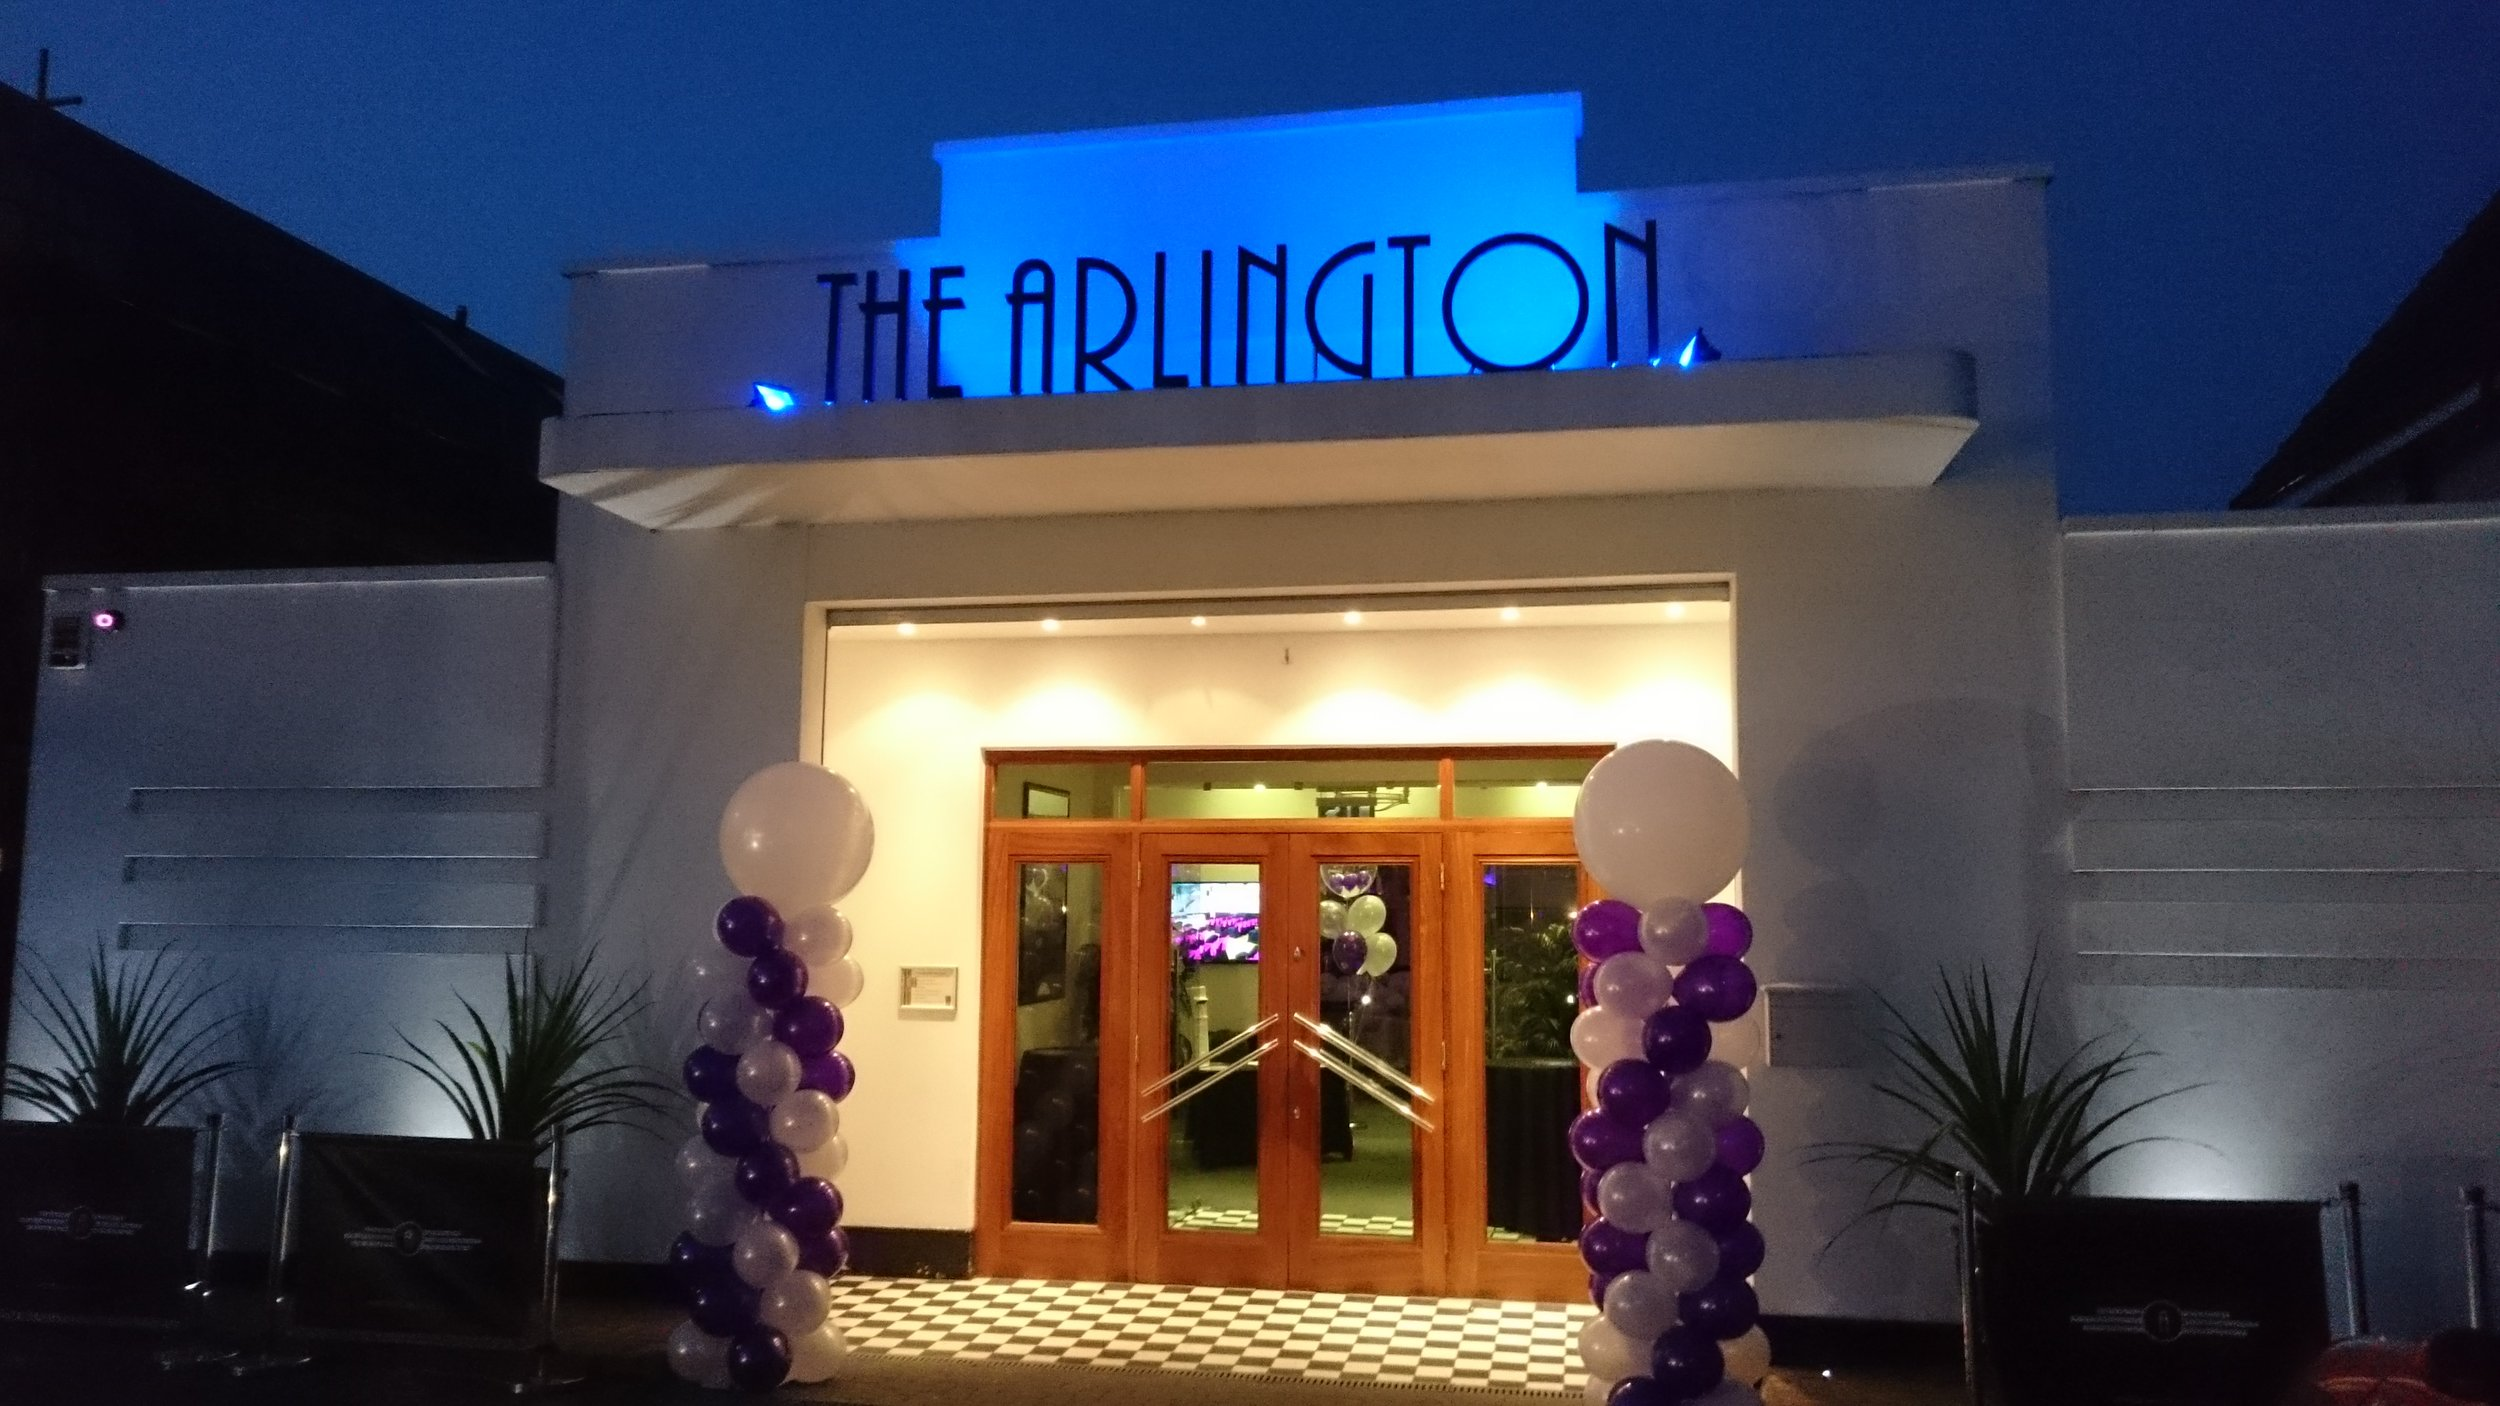 Entrance to the Arlington Ballroom Southend-on-Sea